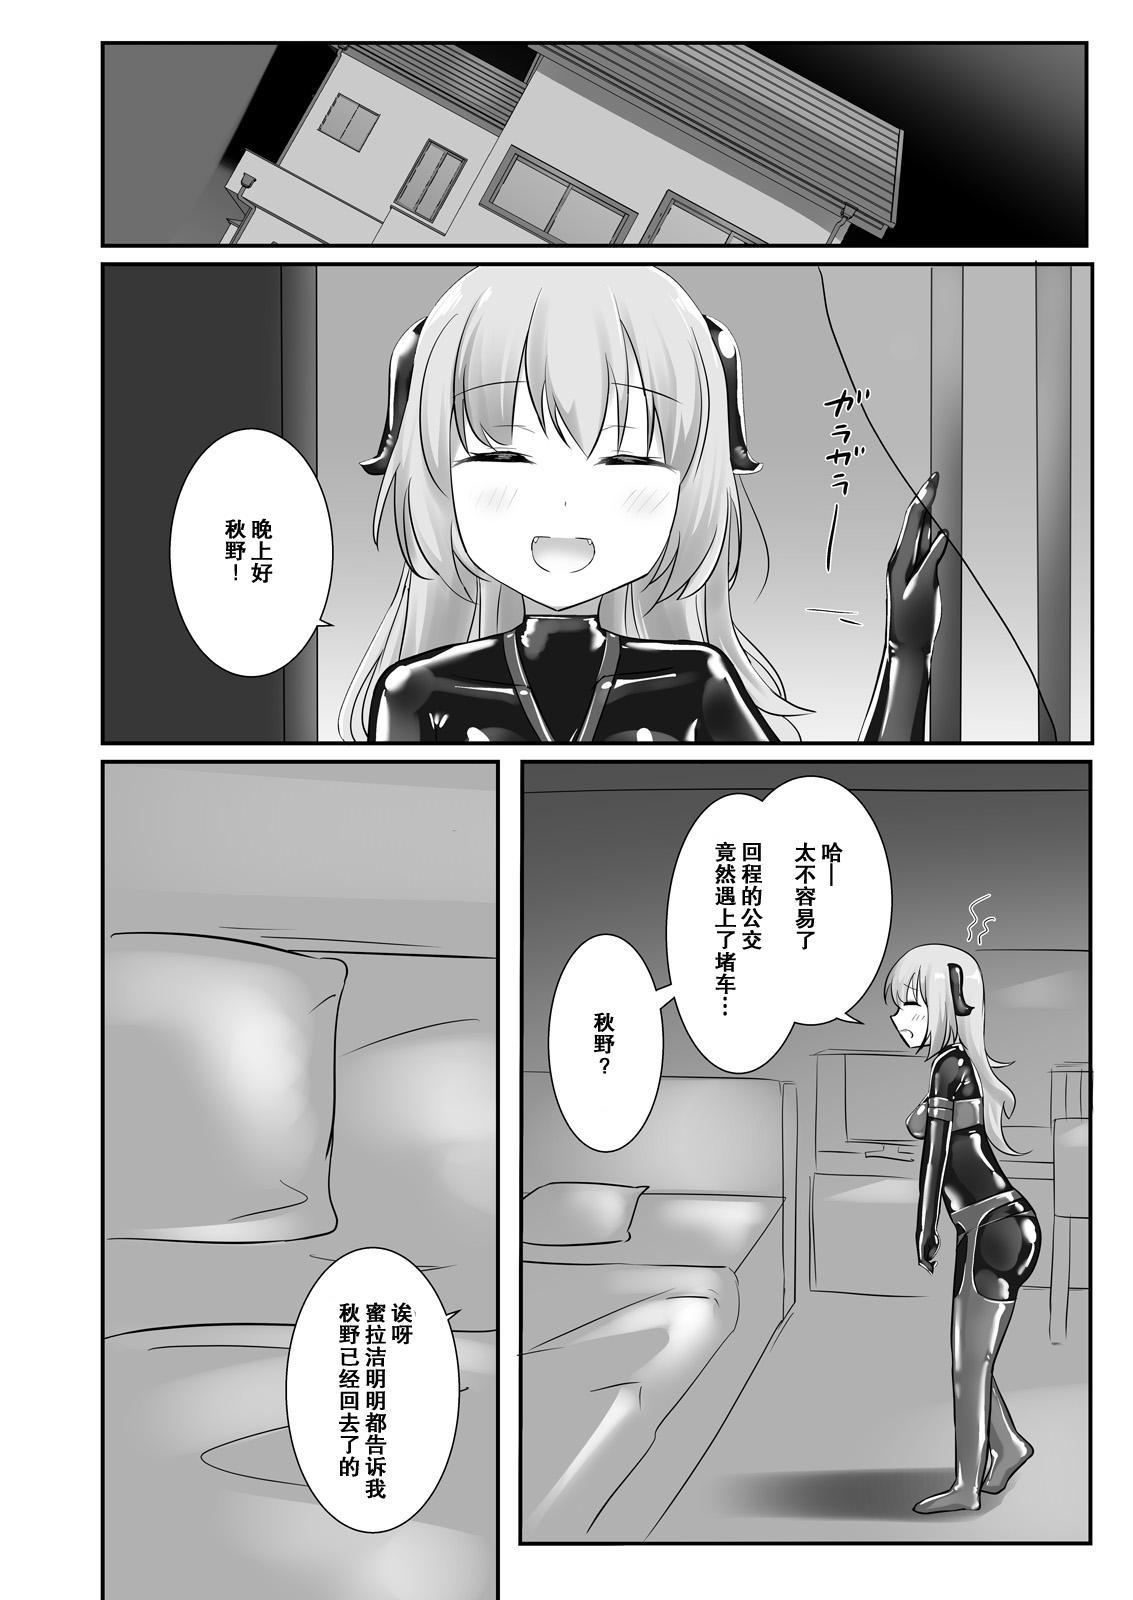 Yumewatari no Mistress night 5 34